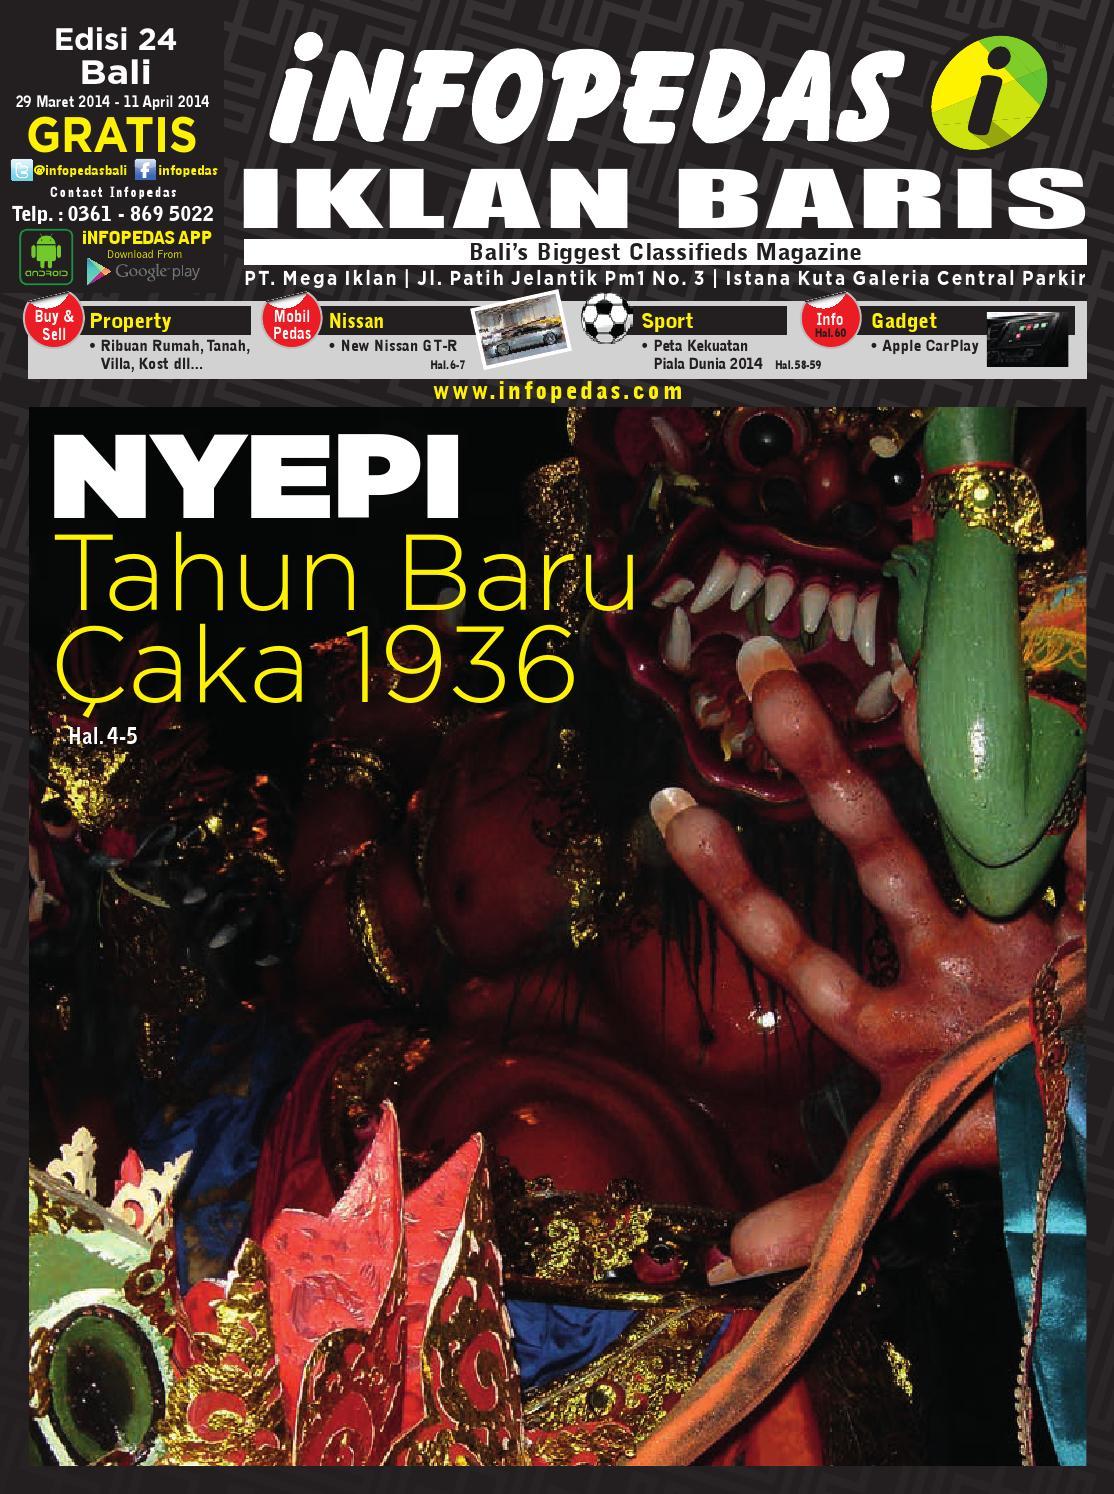 Majalah iNFOPEDAS edisi 24 by PEDAS issuu